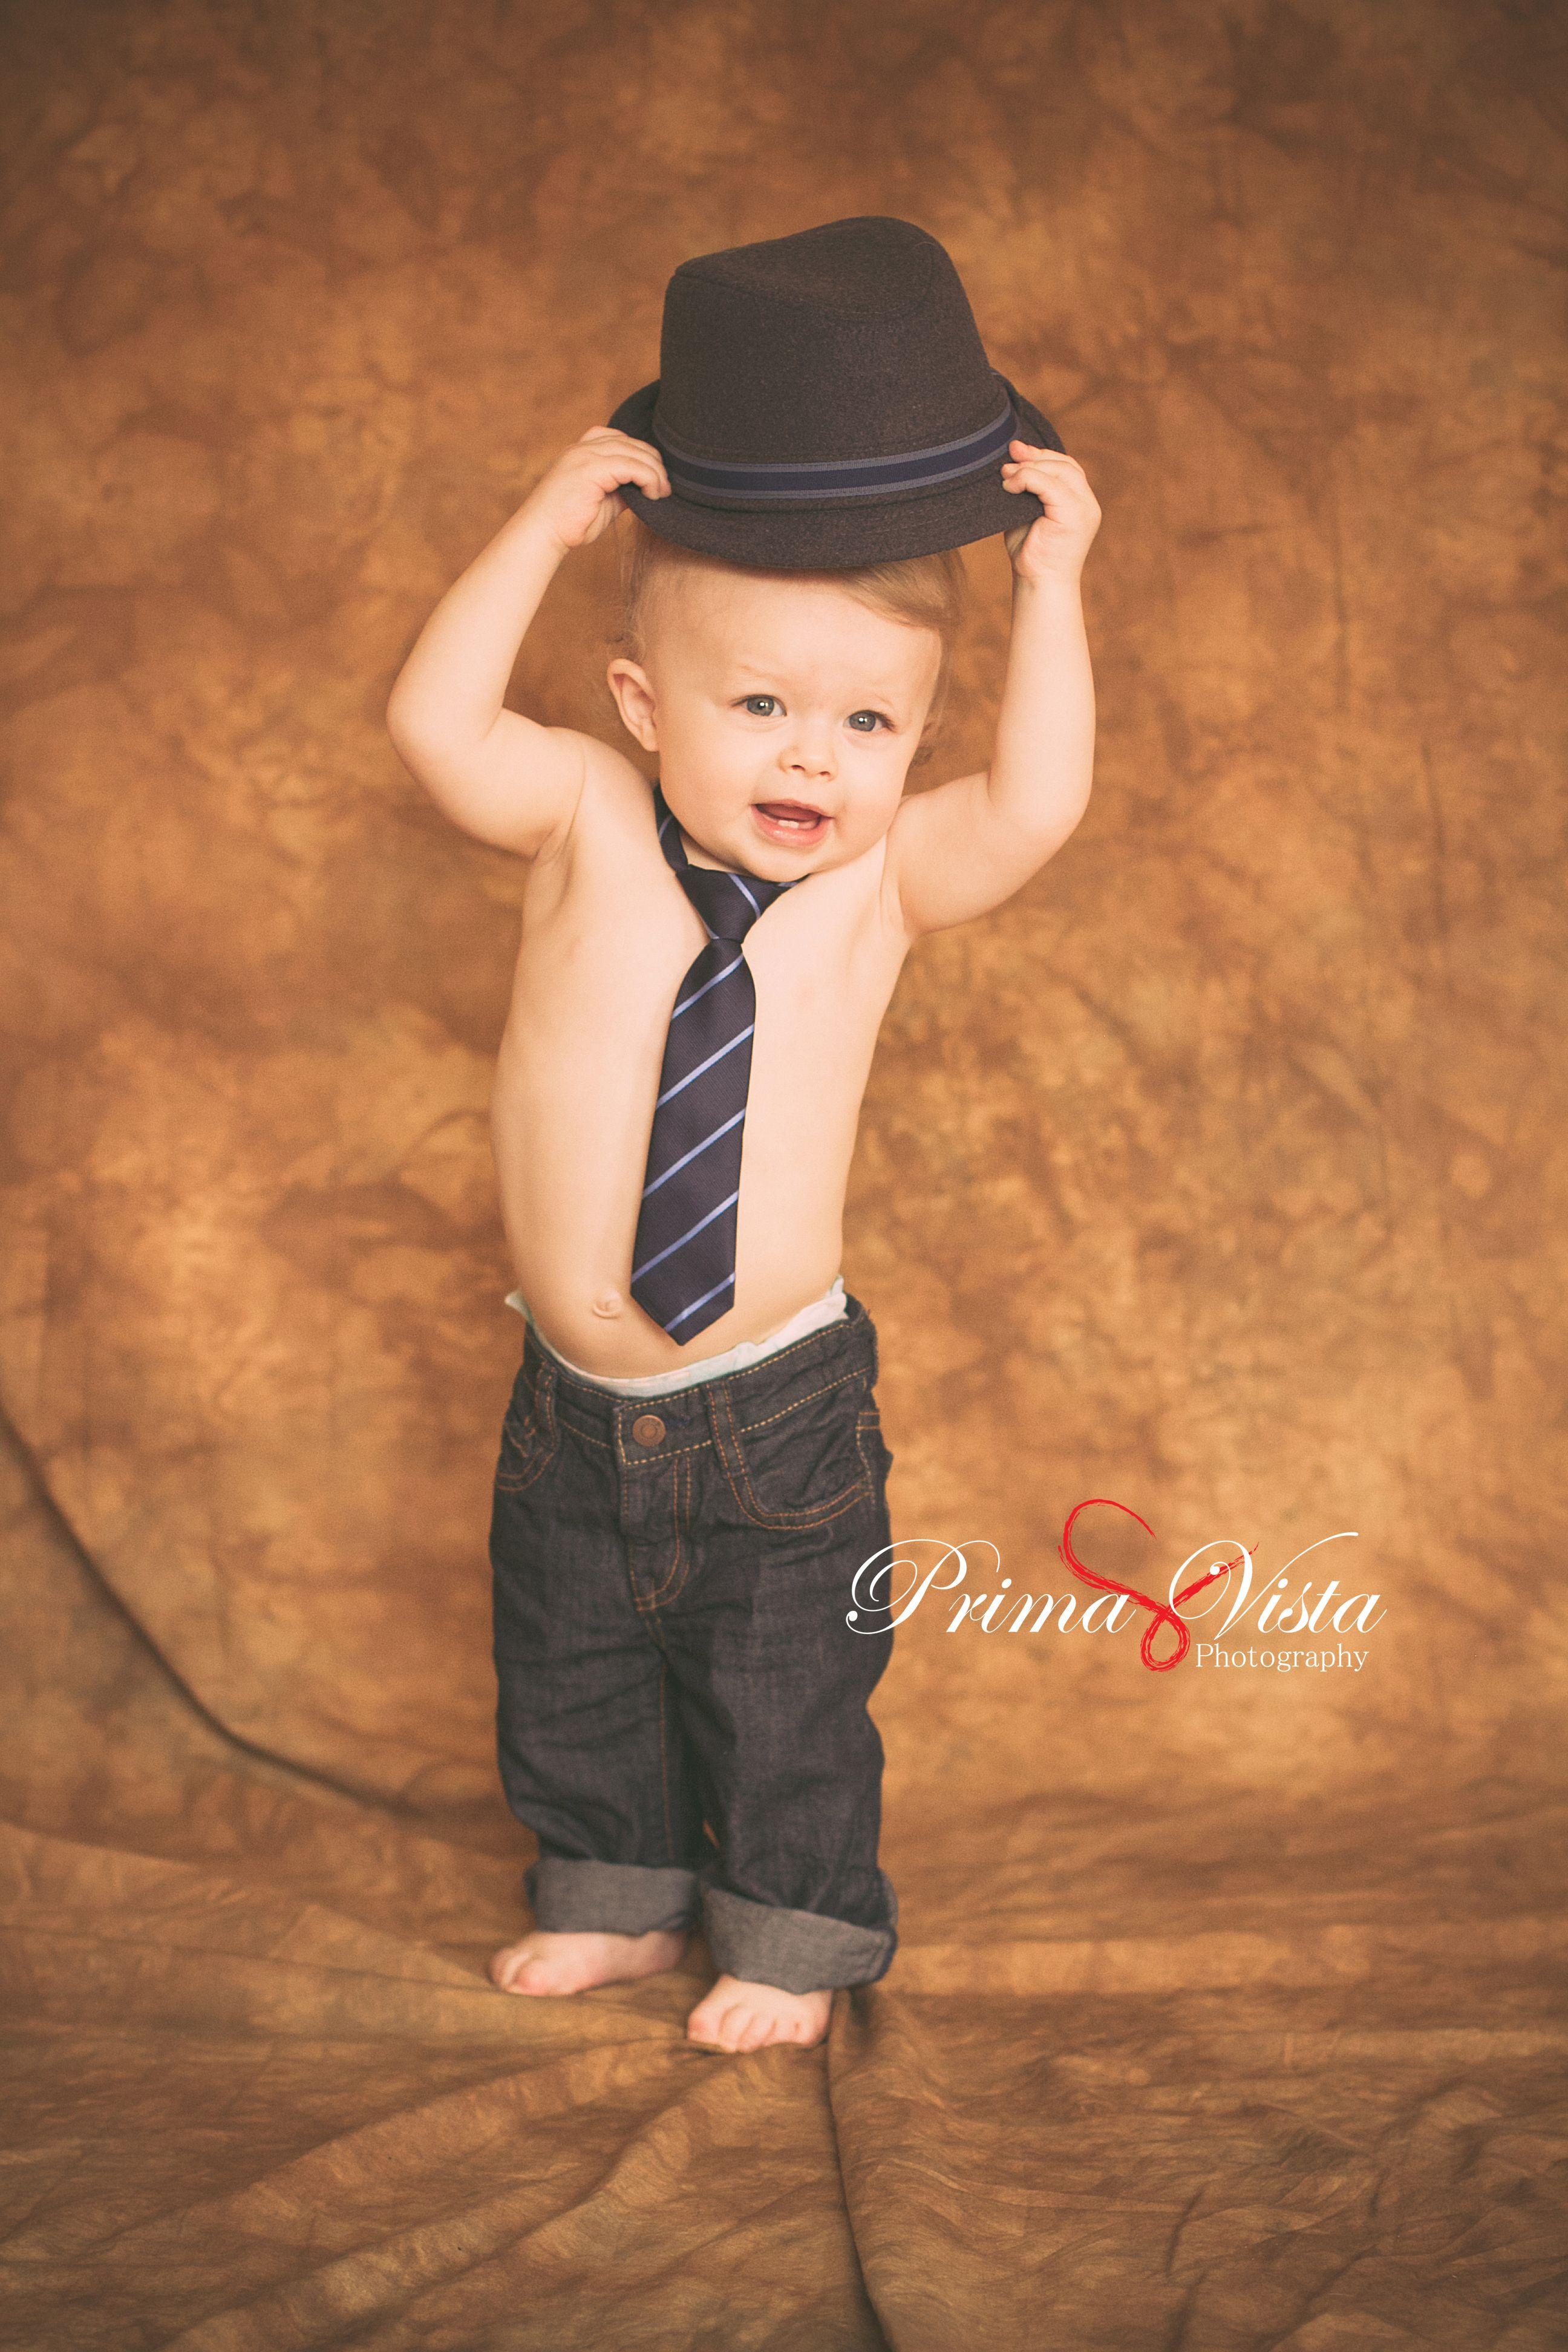 1 Year Old Baby Photoshoot : photoshoot, Prima, Vista, Photography, Babies, Photoshoot, Photos,